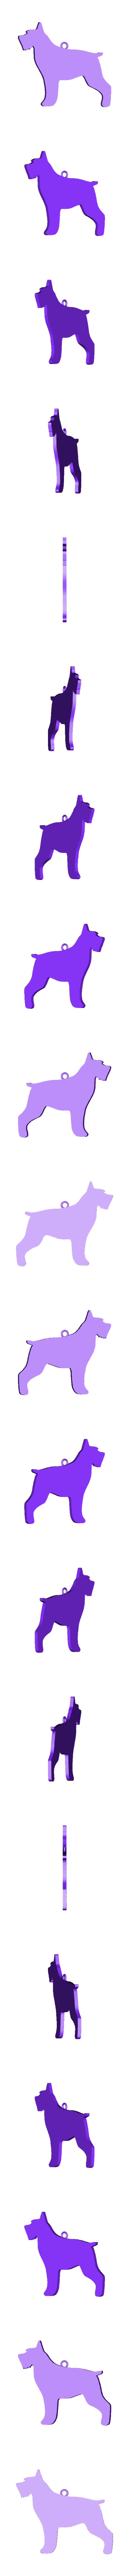 29.stl Download STL file Dogs • 3D printing object, GENNADI3313